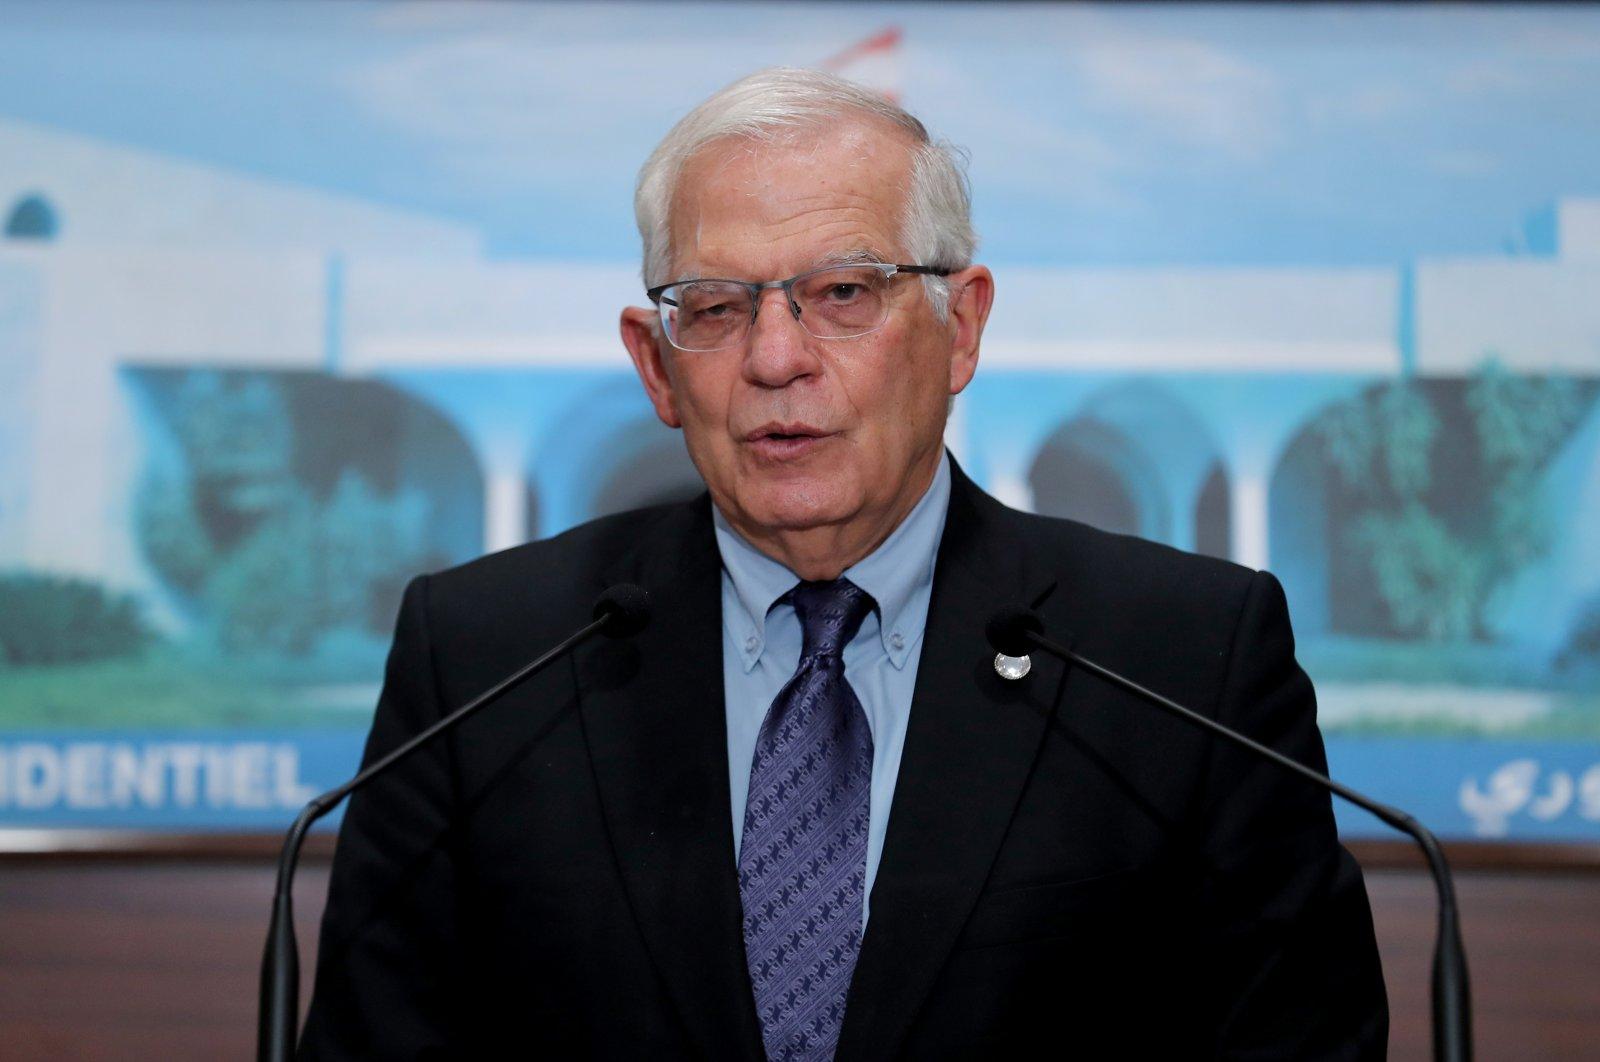 European Union foreign policy chief Josep Borrell speaks at the presidential palace in Baabda, Lebanon, June 19, 2021. (Dalati Nohra / Handout via Reuters)